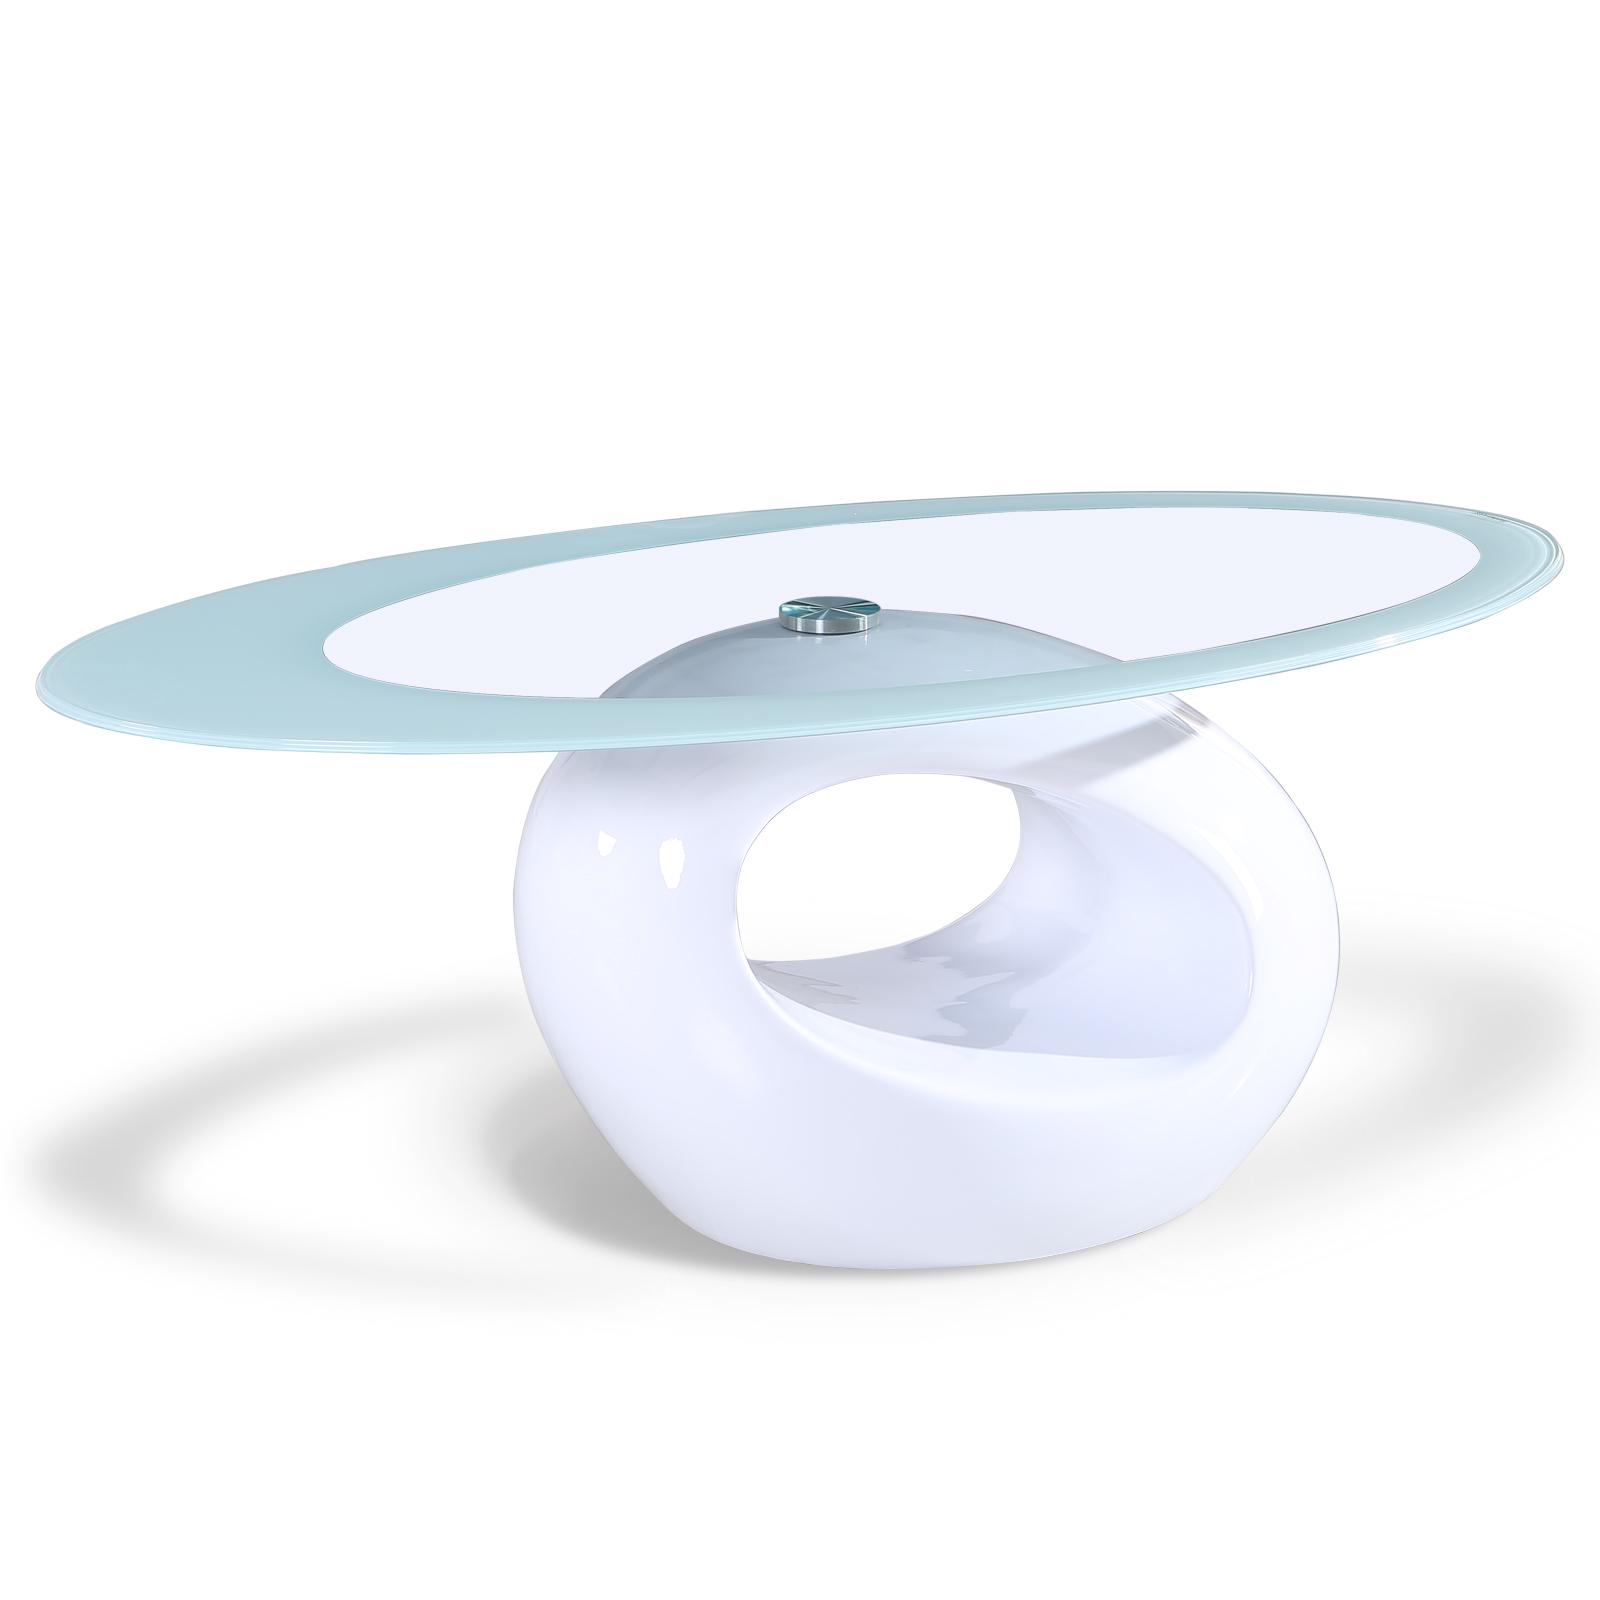 fabulous 1312 tea table living room furniture tempered glass | Modern High Gloss Glass Oval Coffee Table Living Room ...